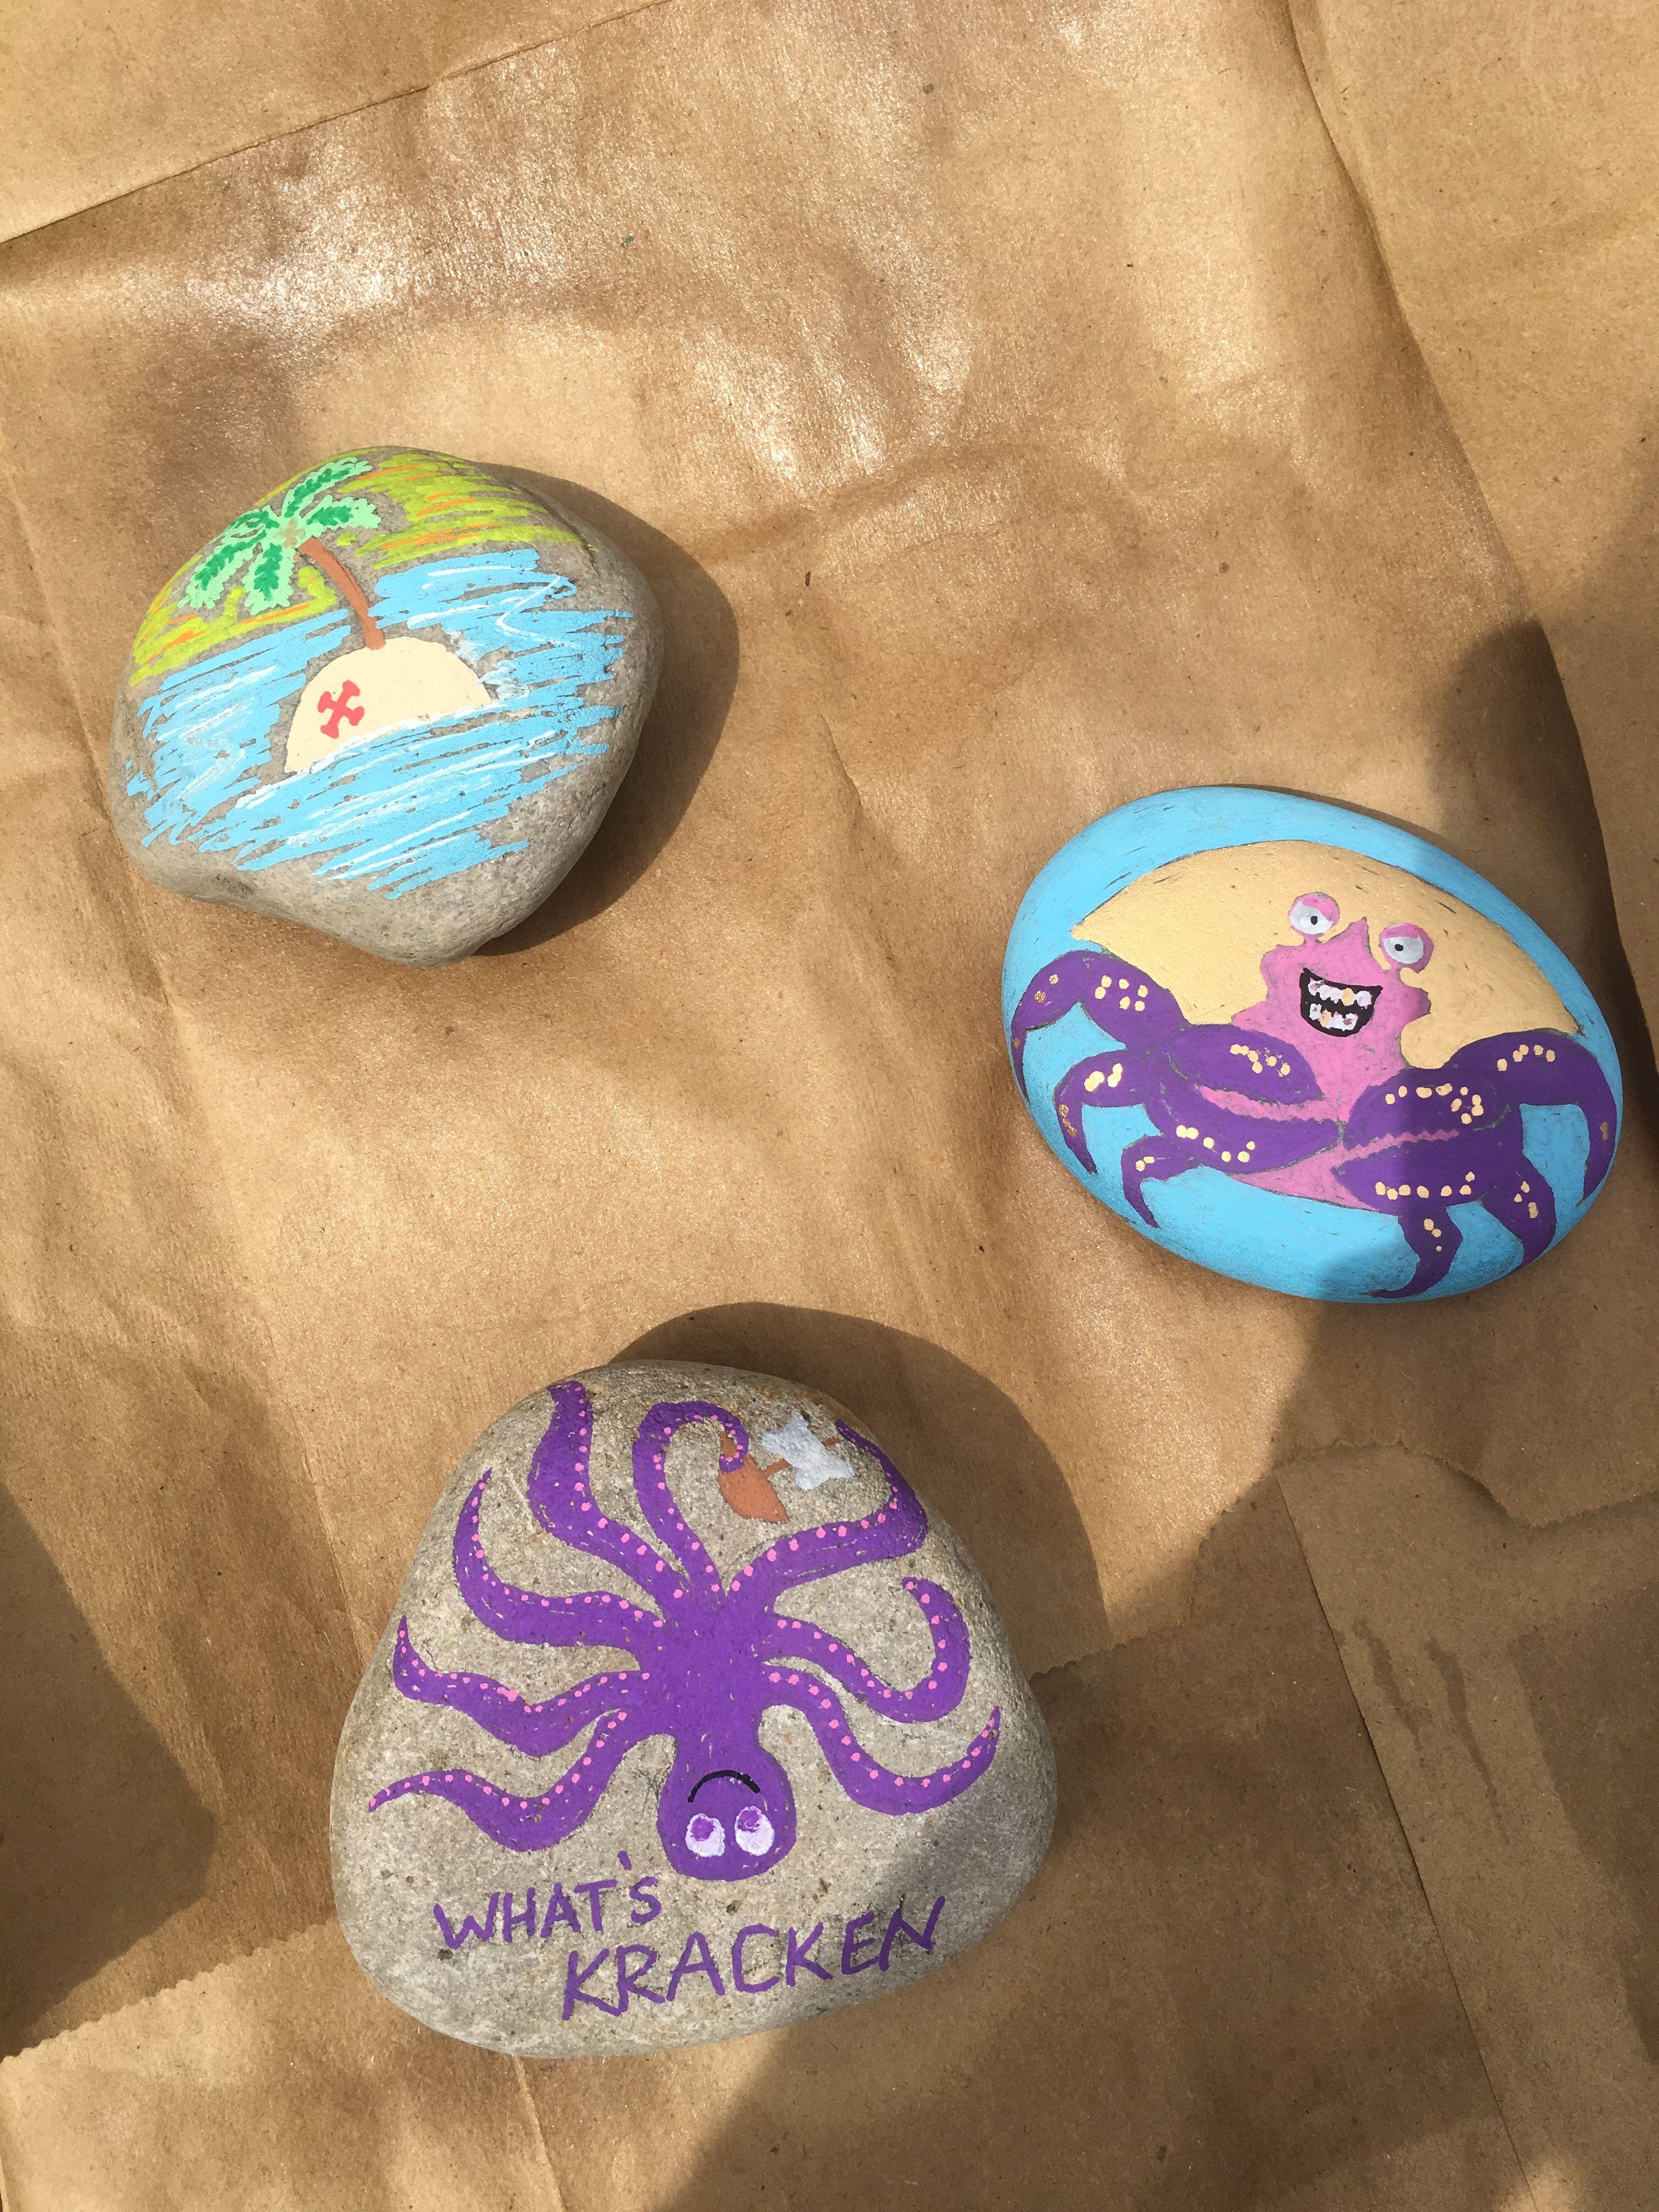 Shiny Kracken Treasure Island Paint Rocks